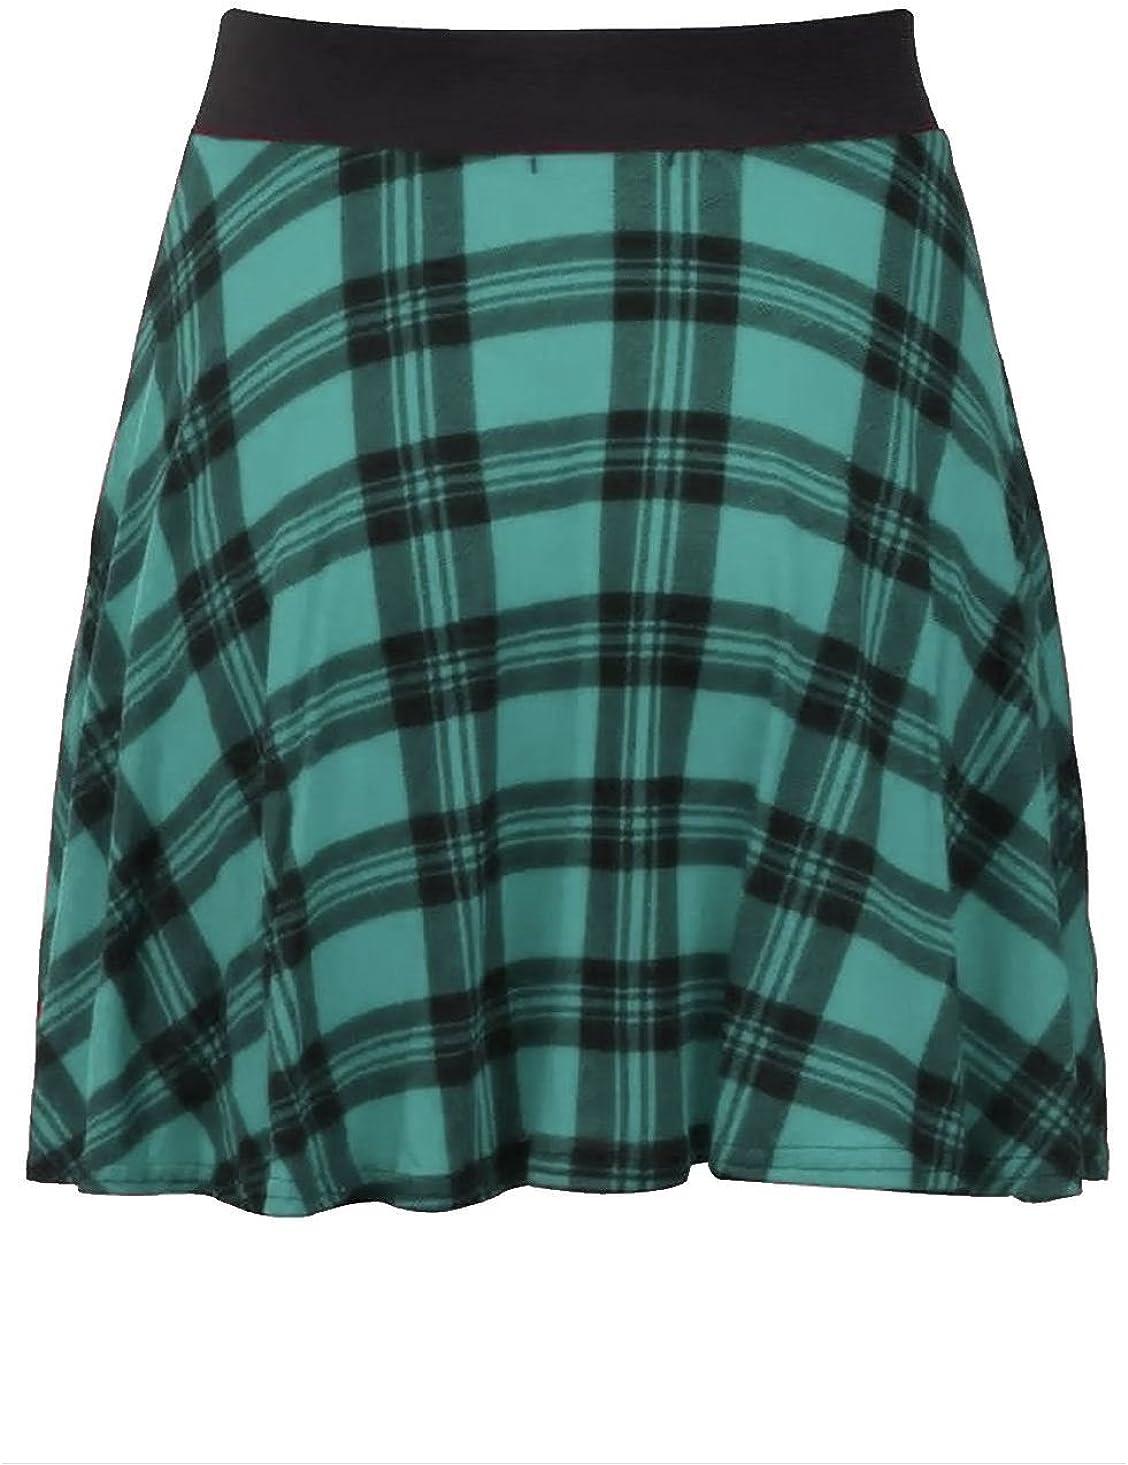 Rimi Hanger Womens Tartan Check Belted Skirt Ladies Elasticated Waist Casual Skater Skirt S/2XL